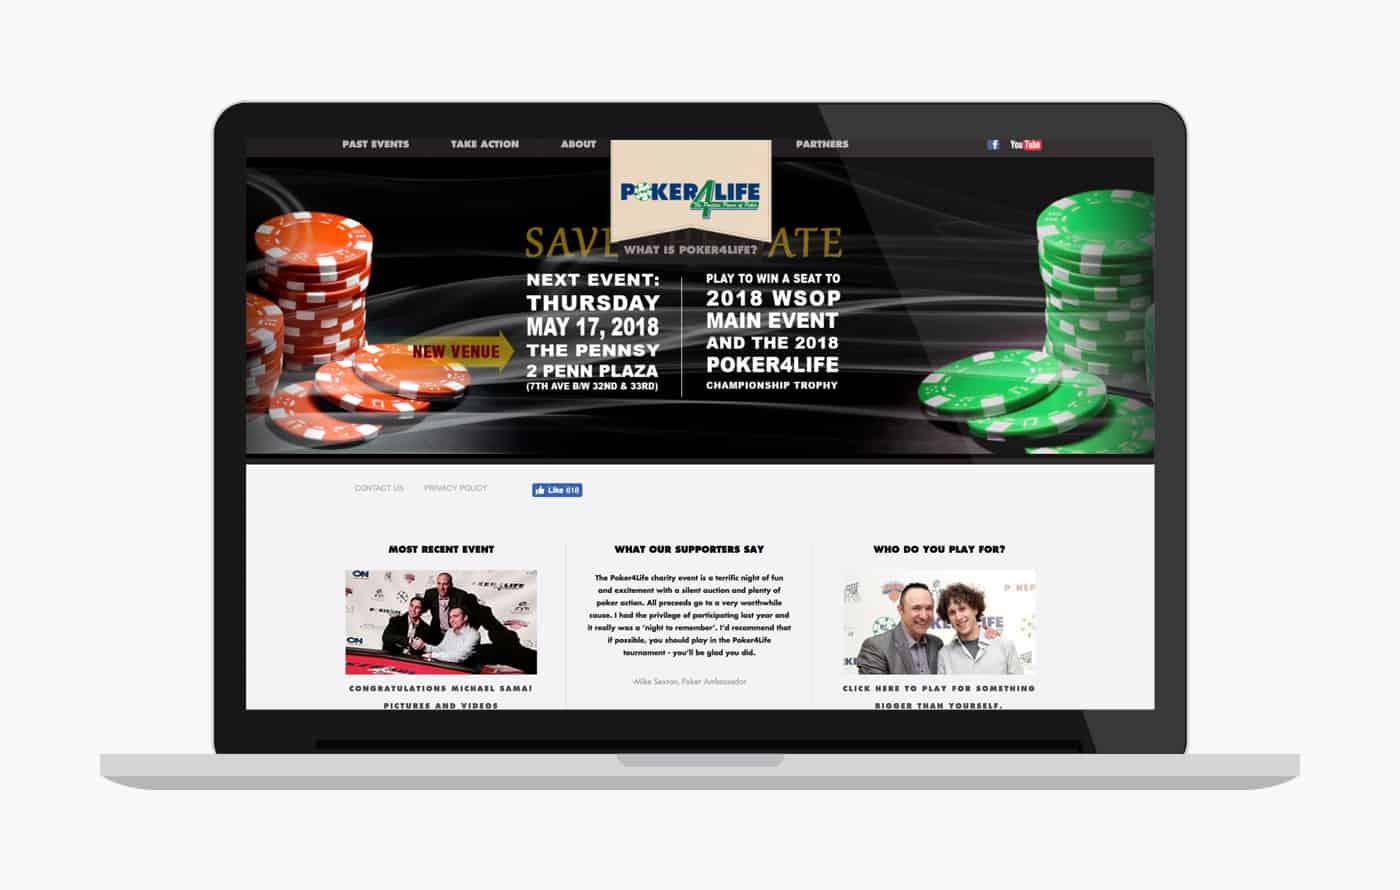 Wordpress Development for Poker4Life Charity